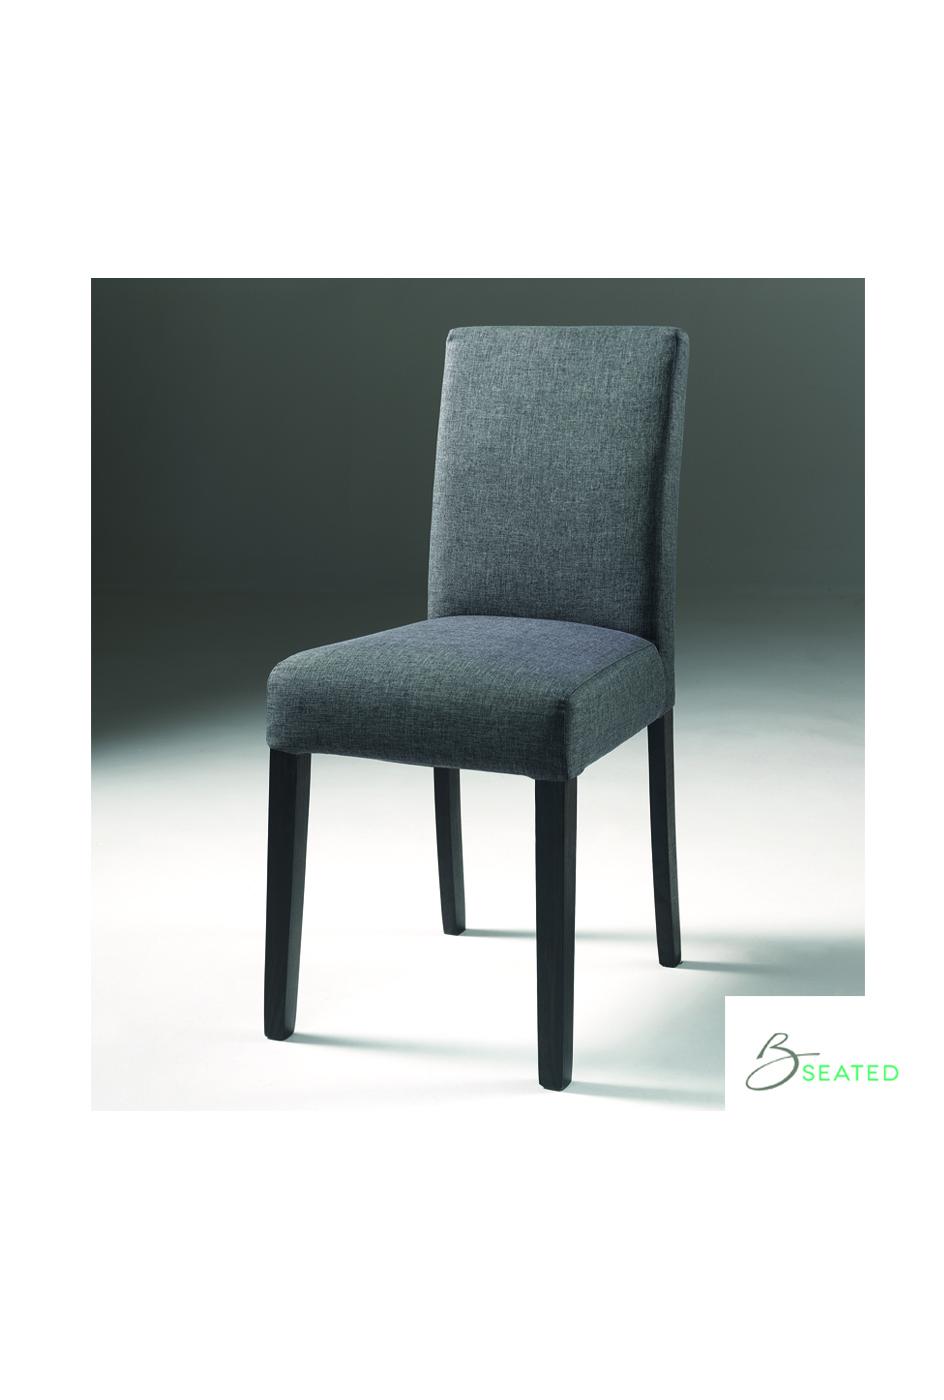 Max stoel savana grijs - Linnen stoel ...